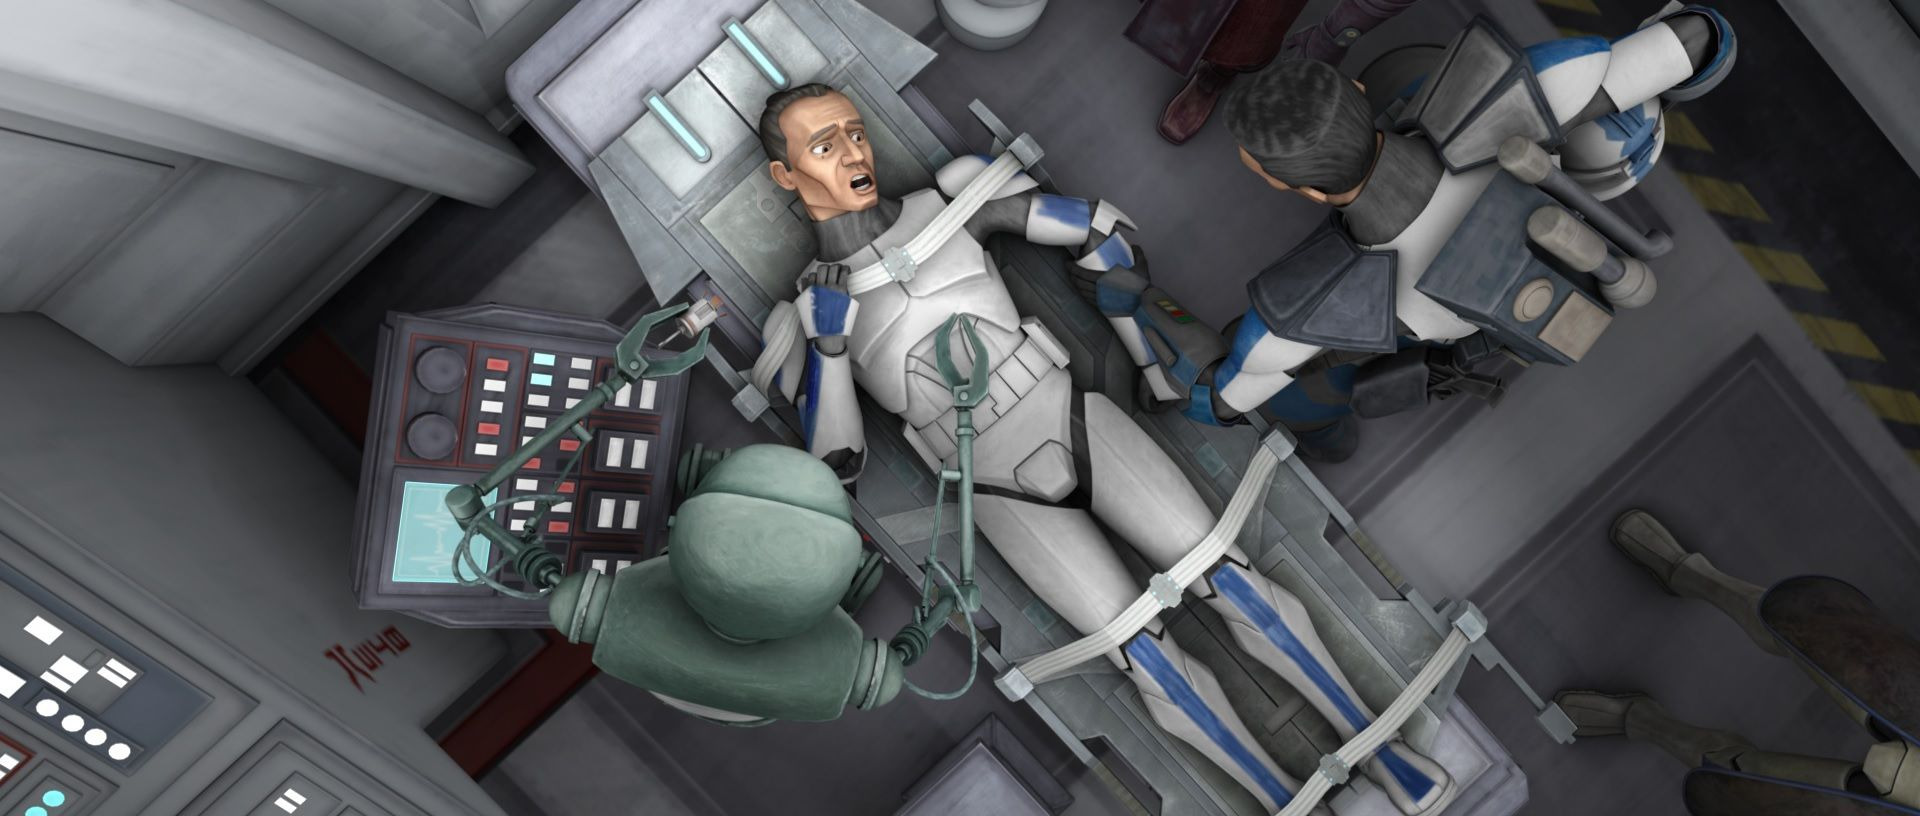 Звездные войны: Войны клонов — s06e01 — The Unknown